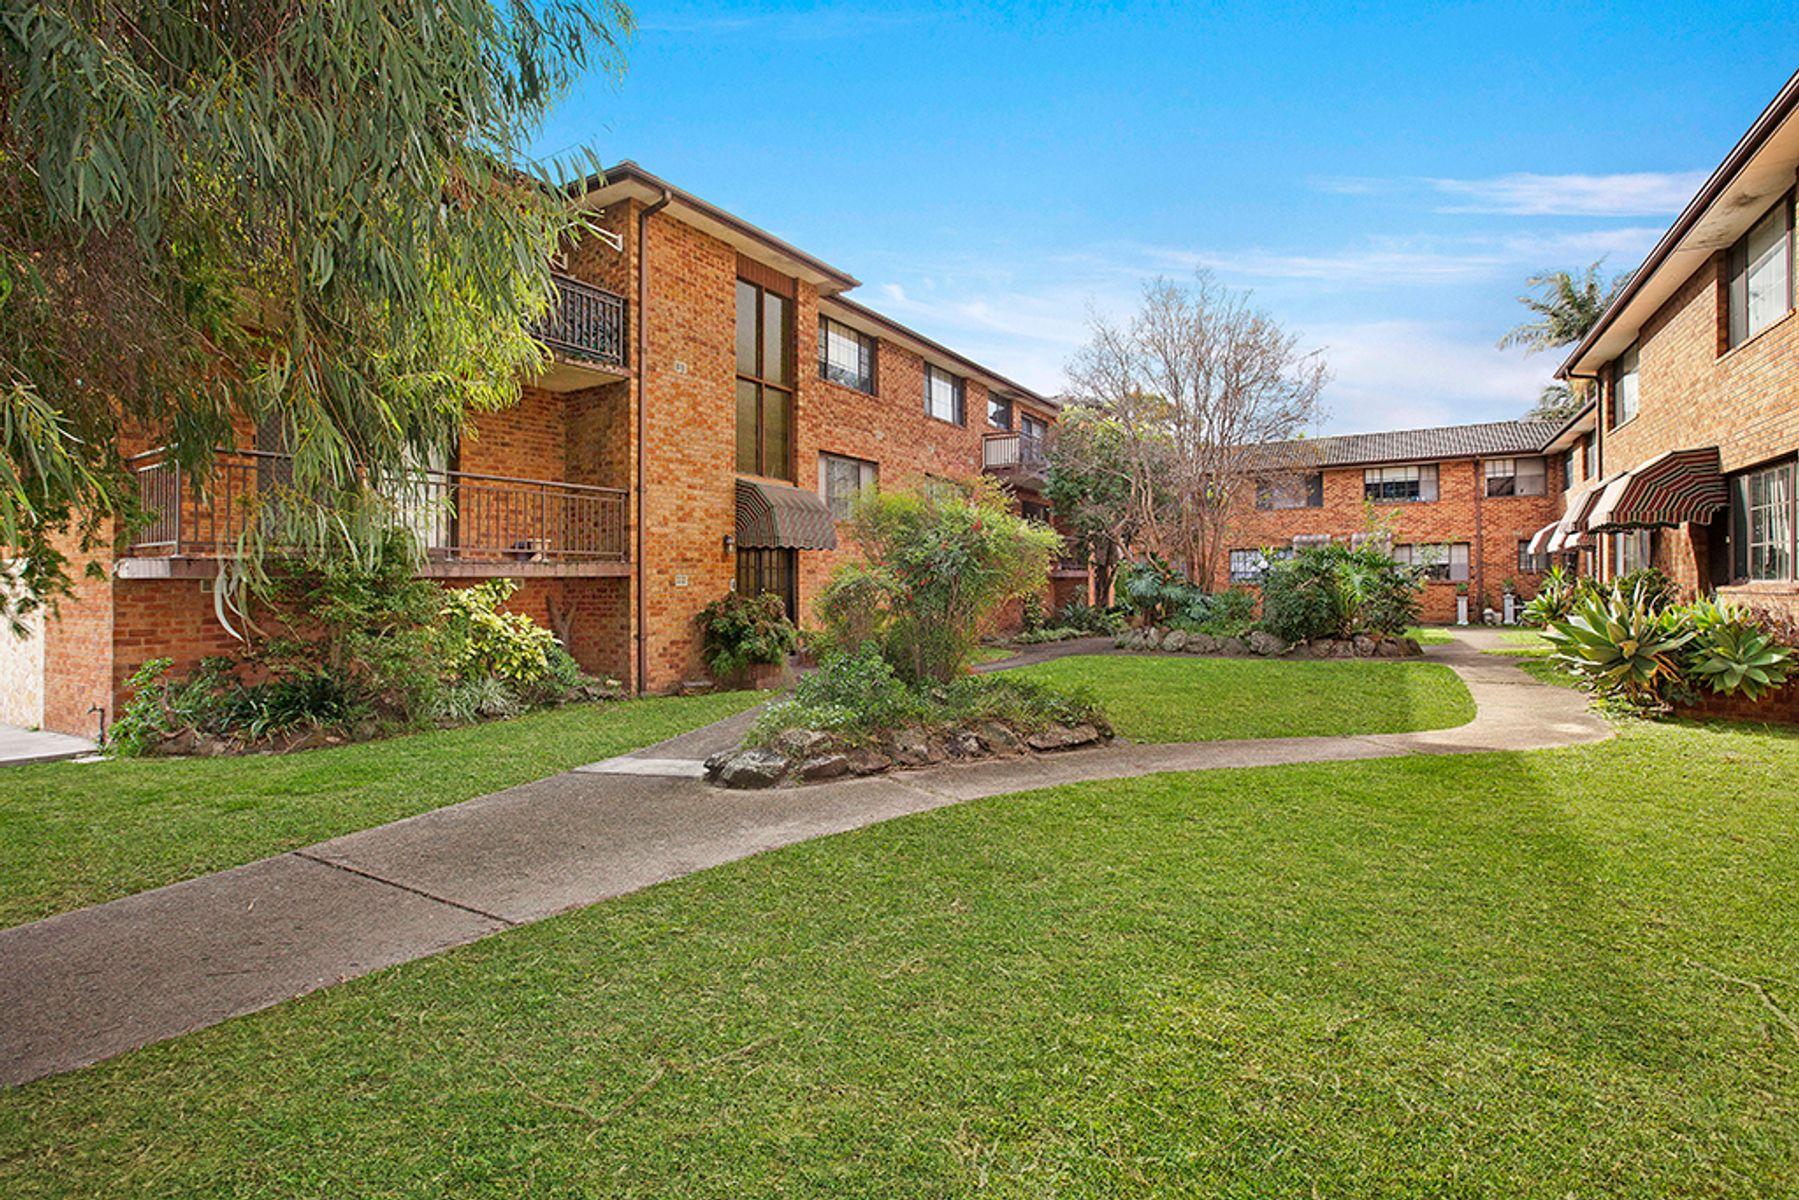 13/6-12 Anderson Street, Belmore, NSW 2192